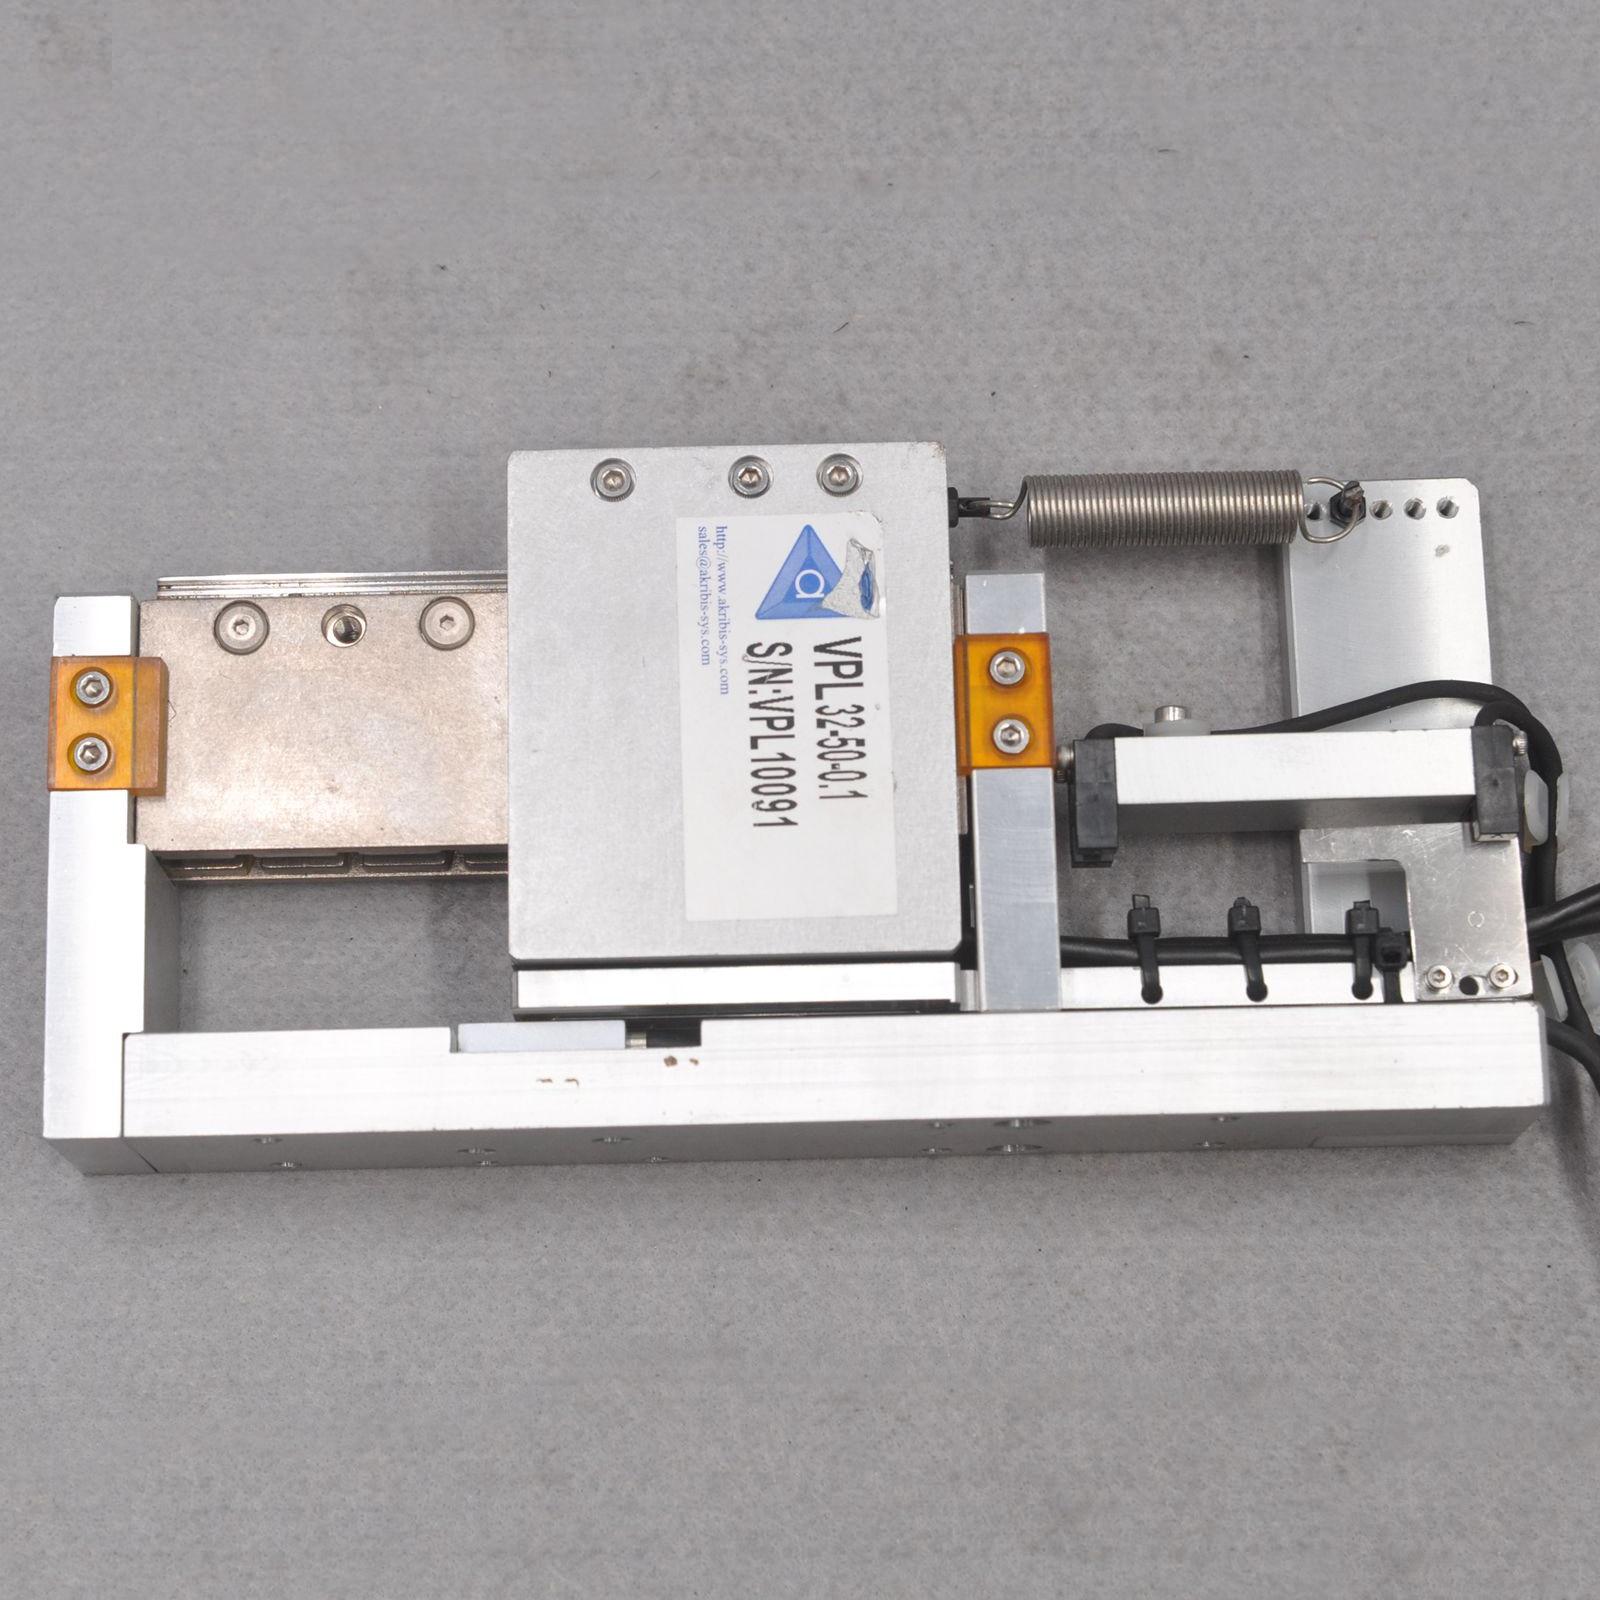 Akribis VPL32-S2-50-0.1 ironless vertical pickup linear motor platform 1 enlarge